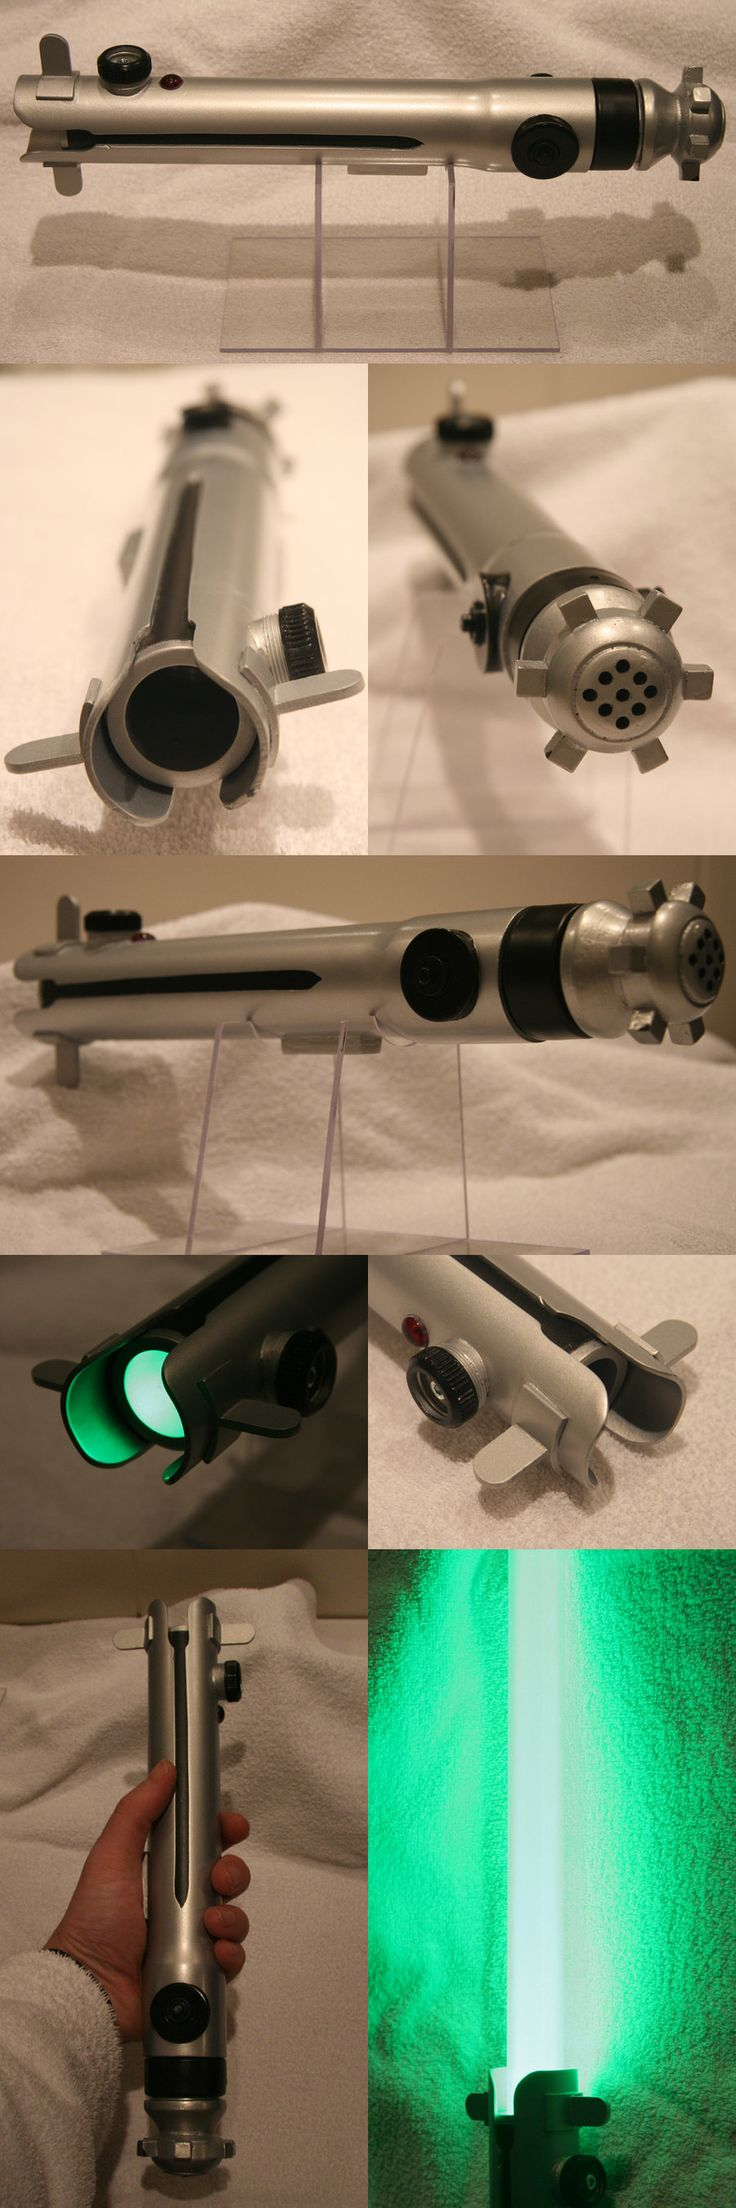 Ahsoka Tano PVC saber finished by Mace2006.deviantart.com on @DeviantArt